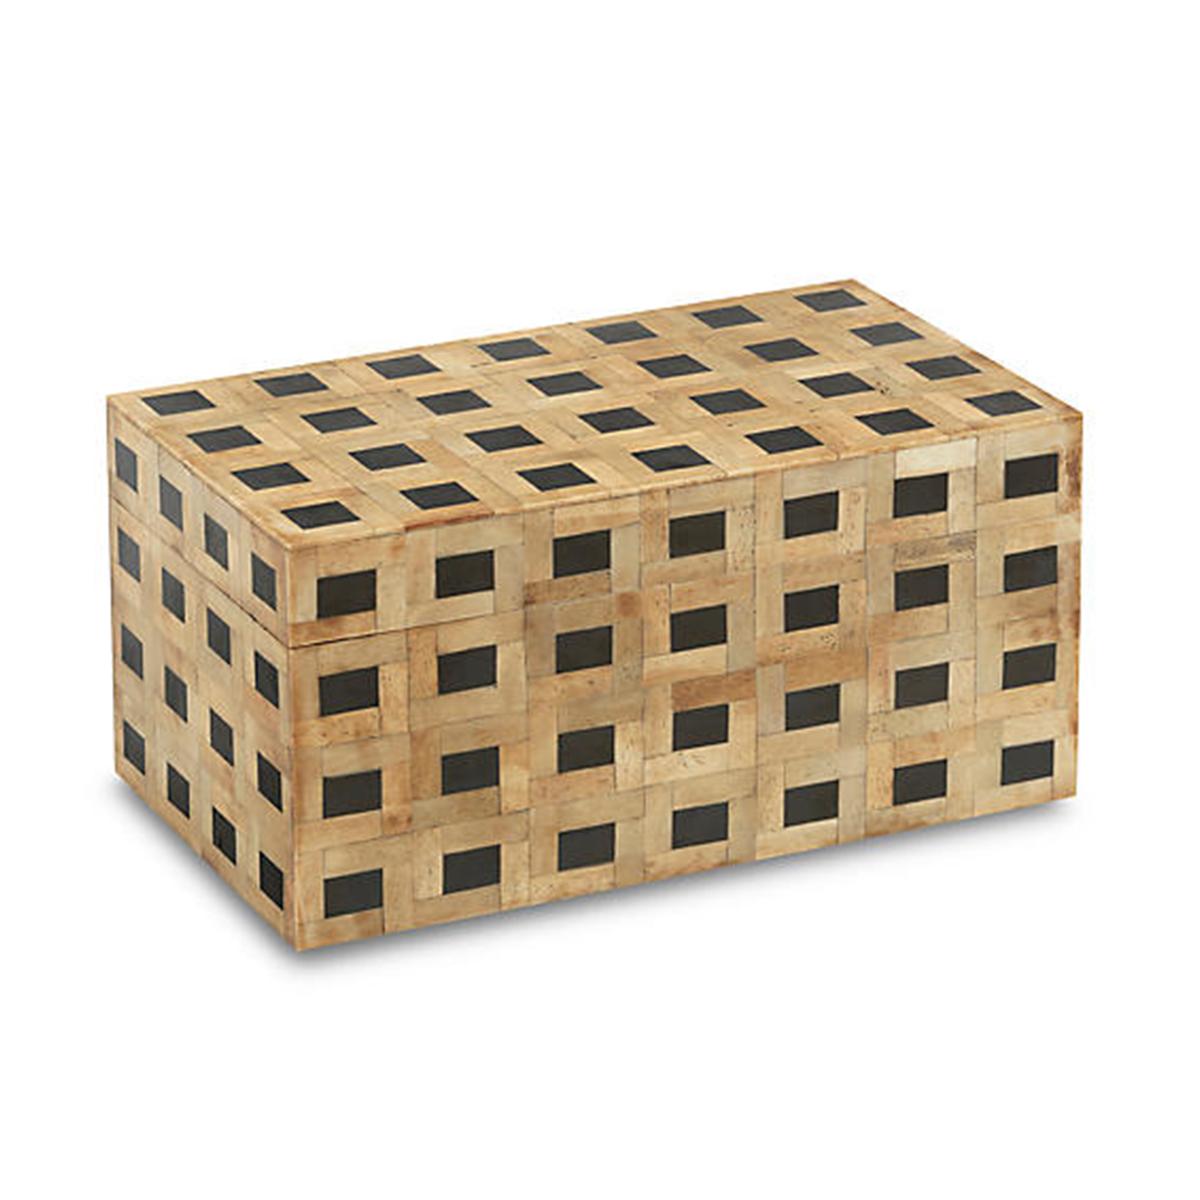 black and tan bunny williams box.jpg